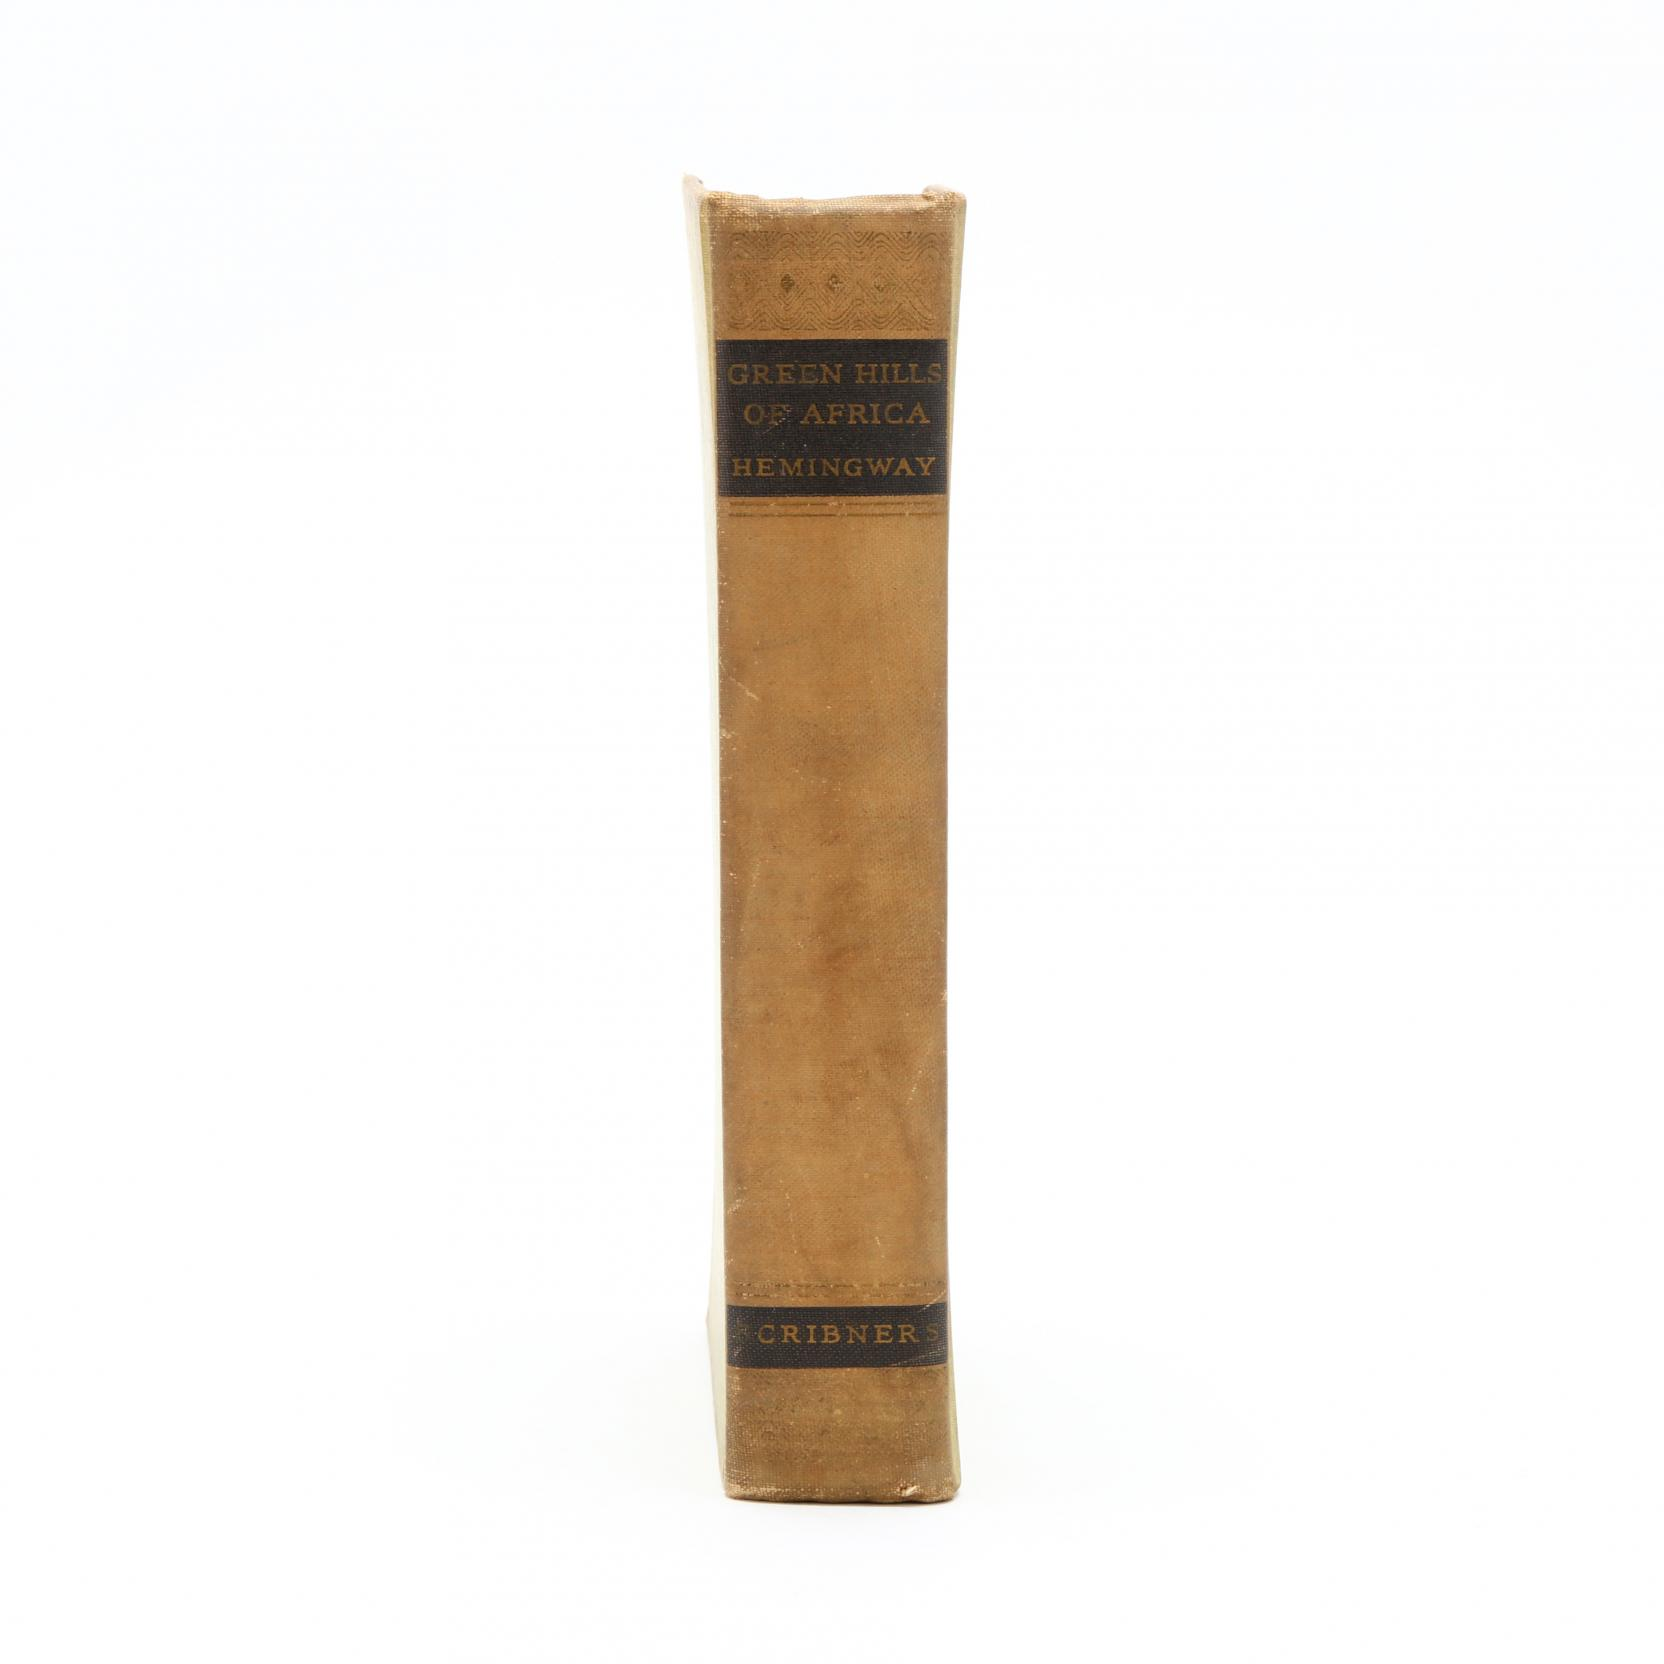 hemingway-ernest-i-green-hills-of-africa-i-first-edition